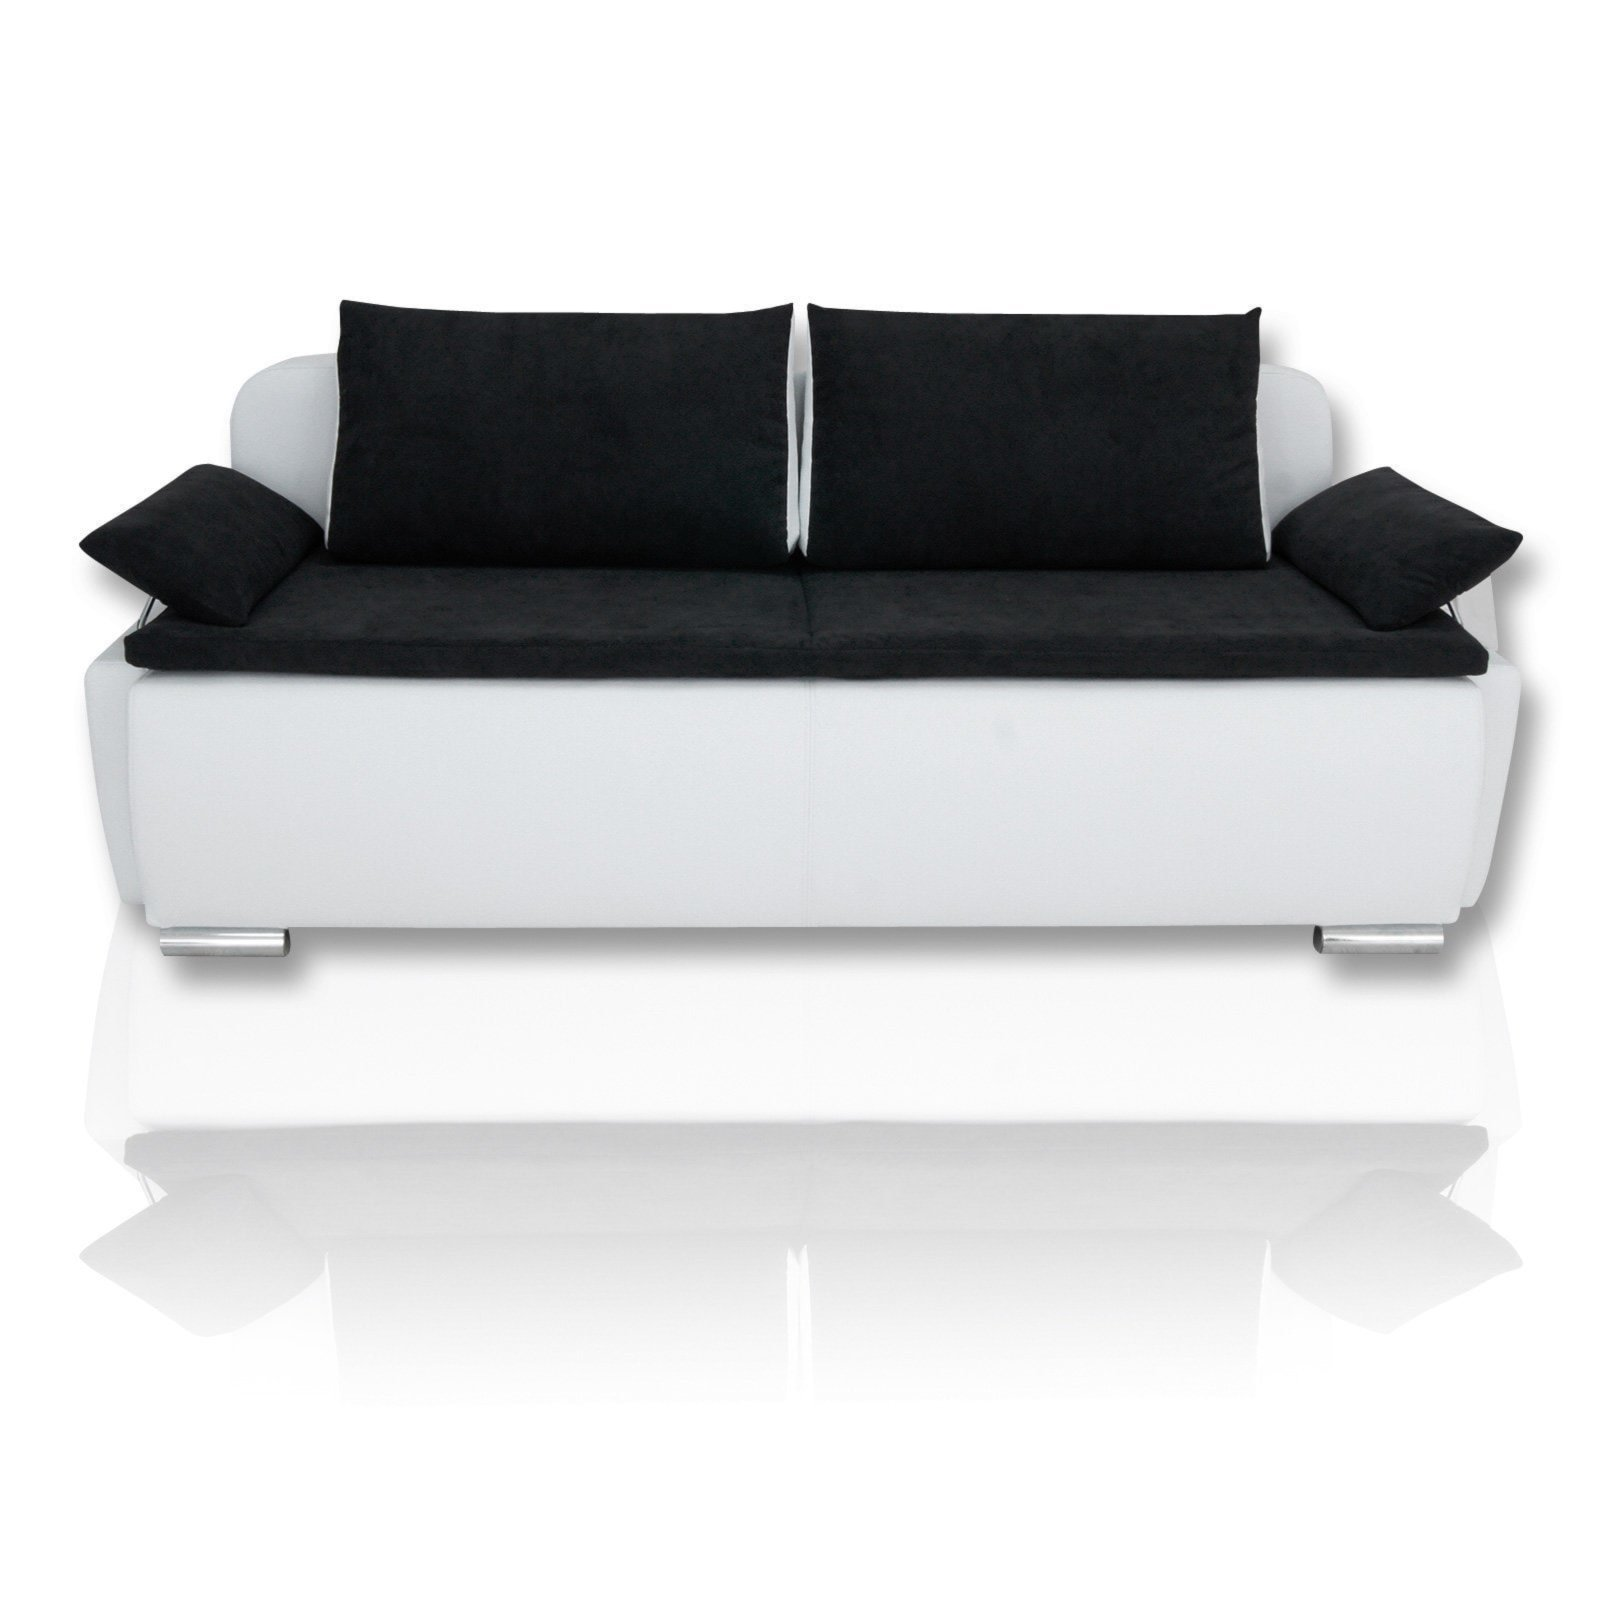 boxspringsofa schwarz wei dauerschl fer boxspringsofas sofas couches m bel roller. Black Bedroom Furniture Sets. Home Design Ideas